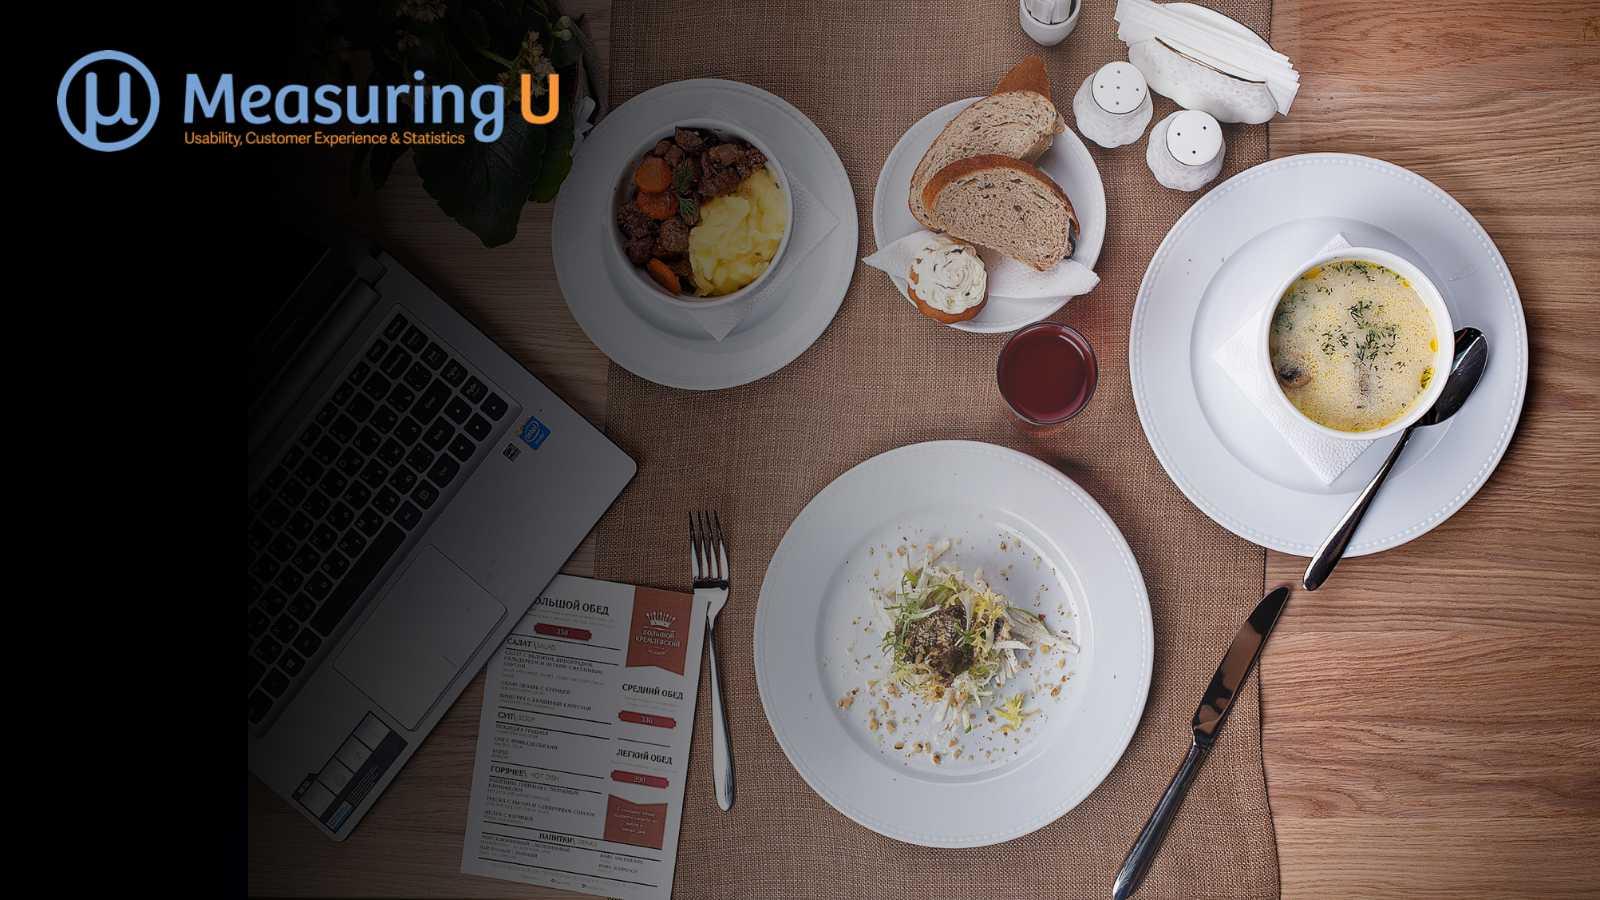 Measuringu The Ux Of Restaurant Websites